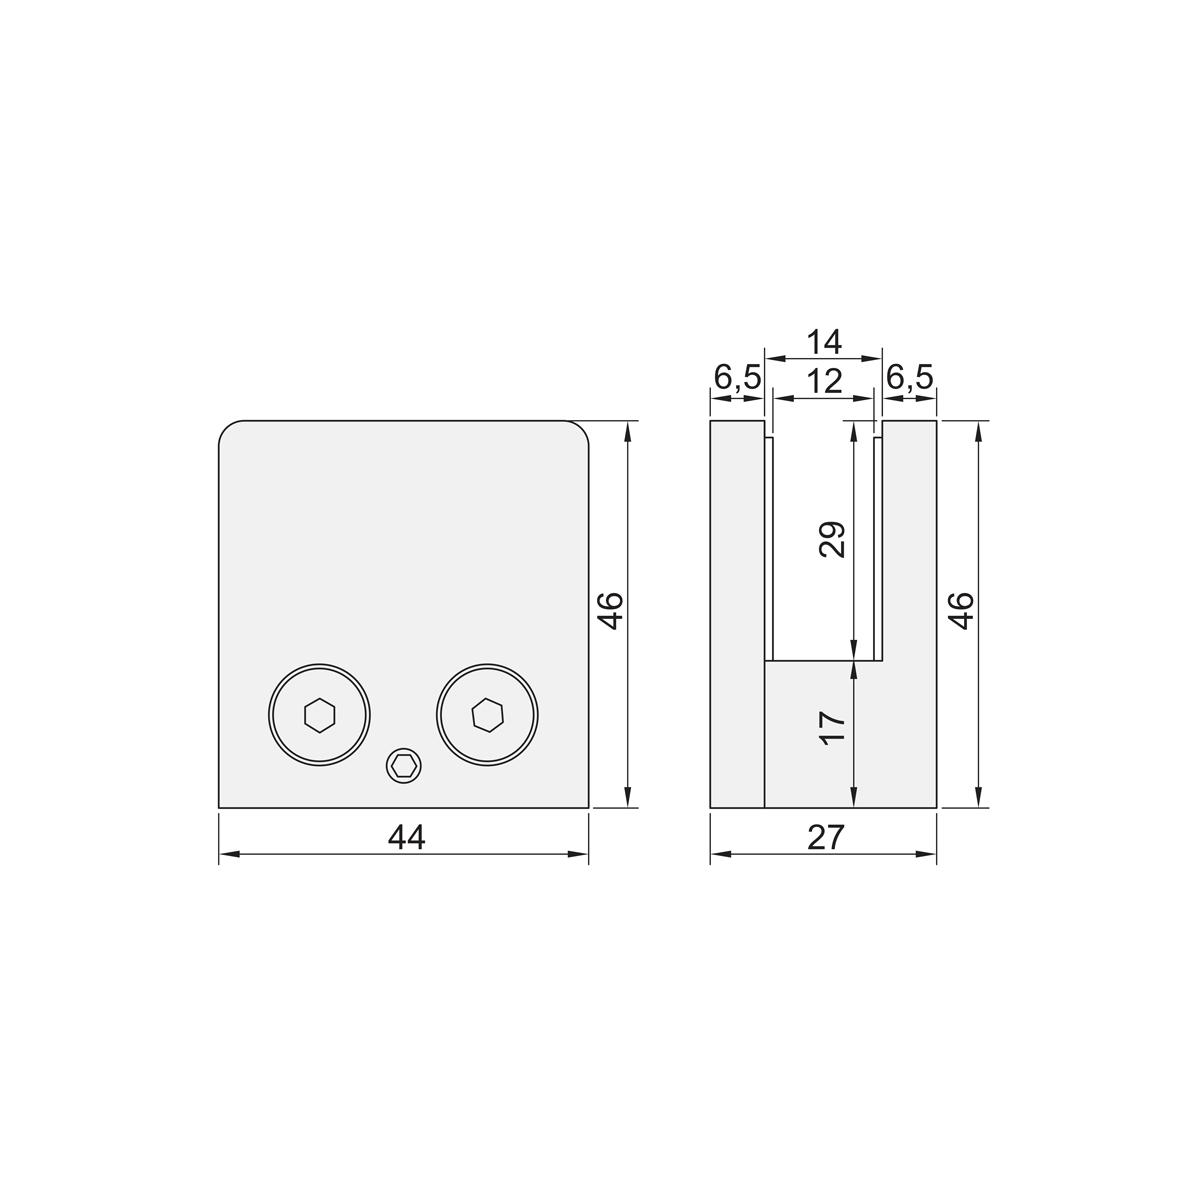 Slika: GS GC 109 (OD-S900) Spojnica fiksna INOX POL